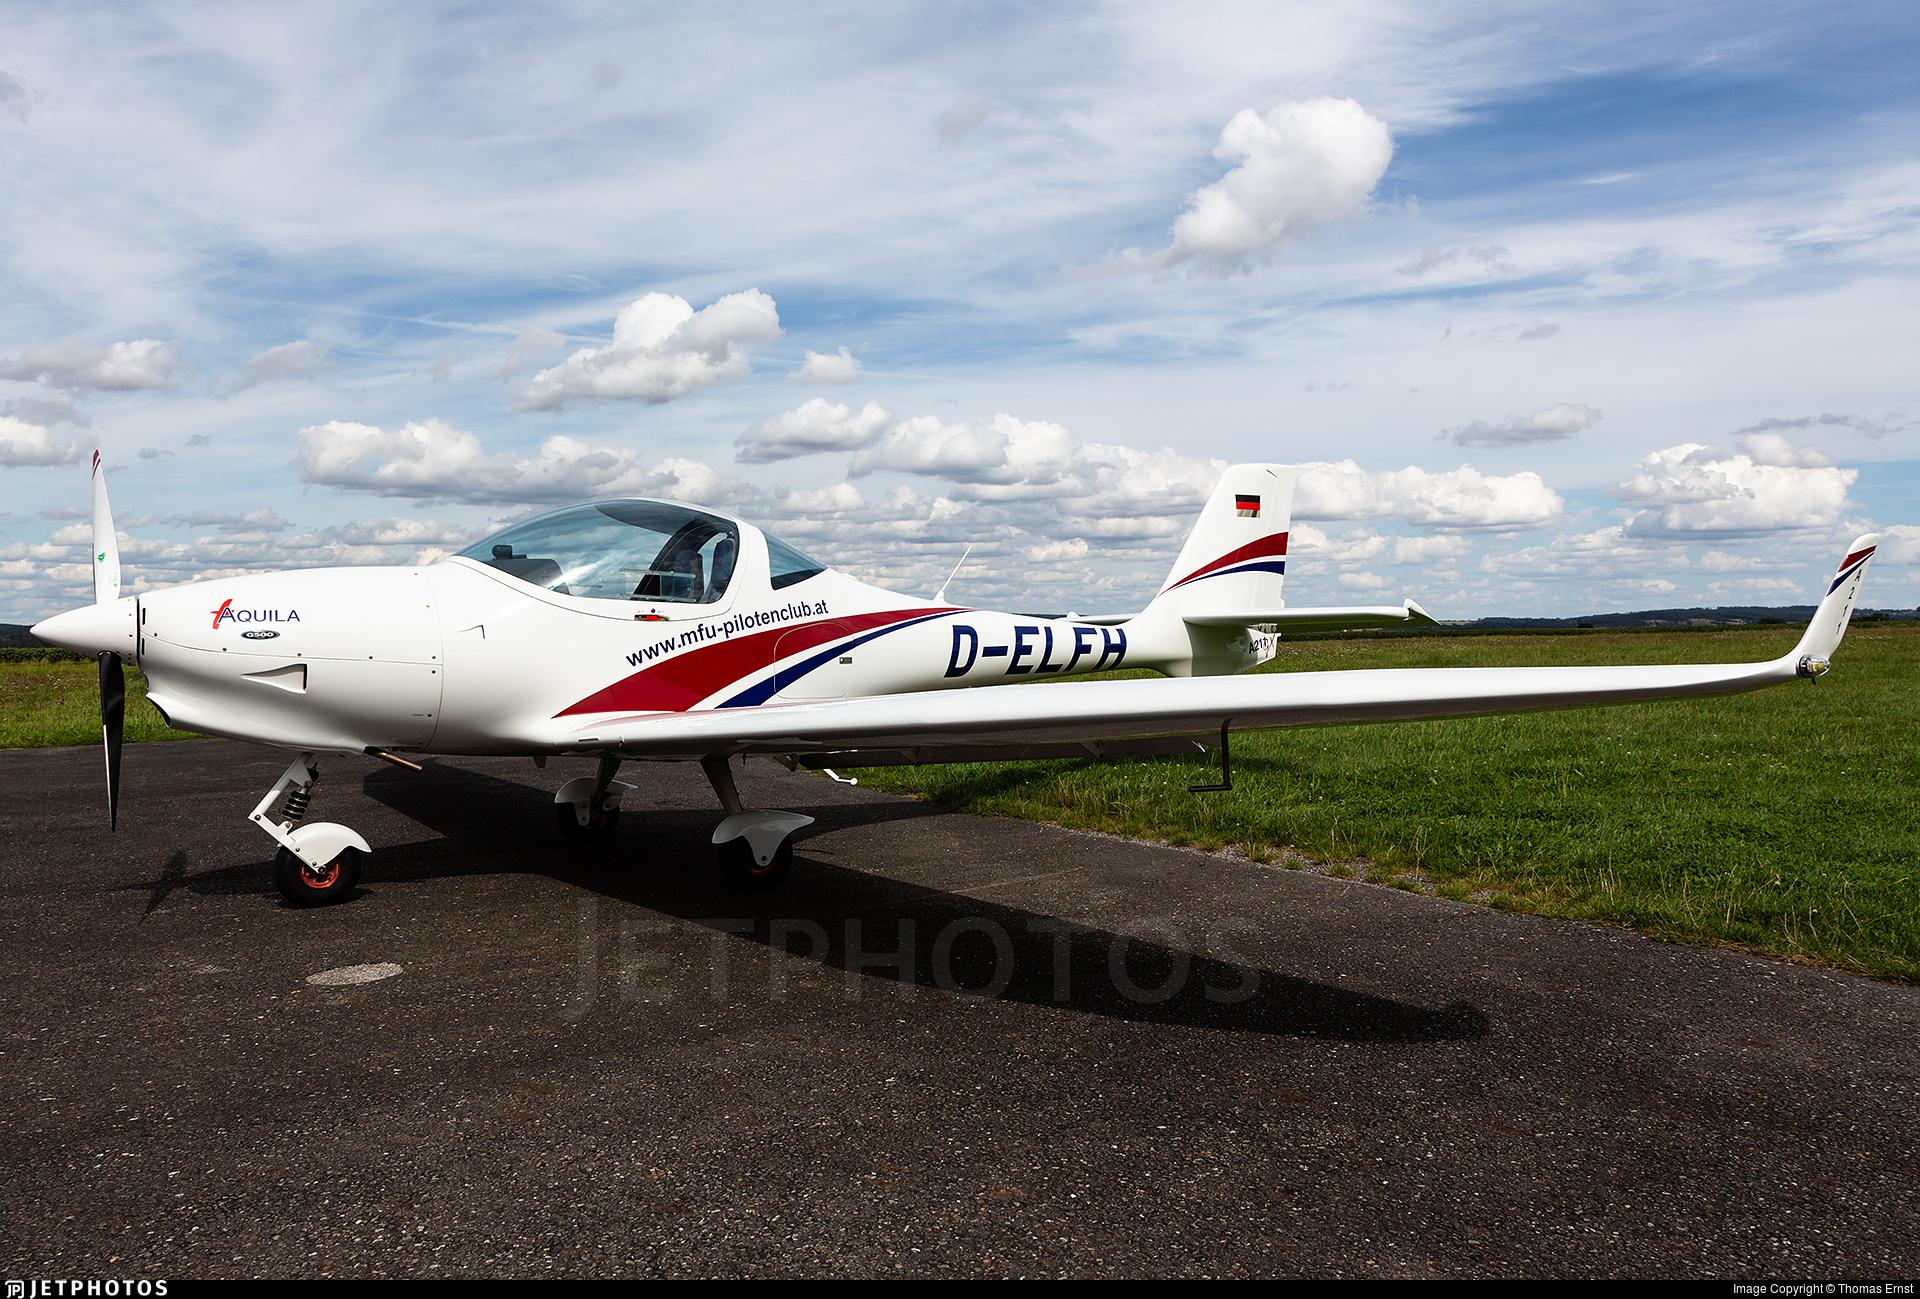 D-ELFH - Aquila A211GX - Motorflug Union (MFU)